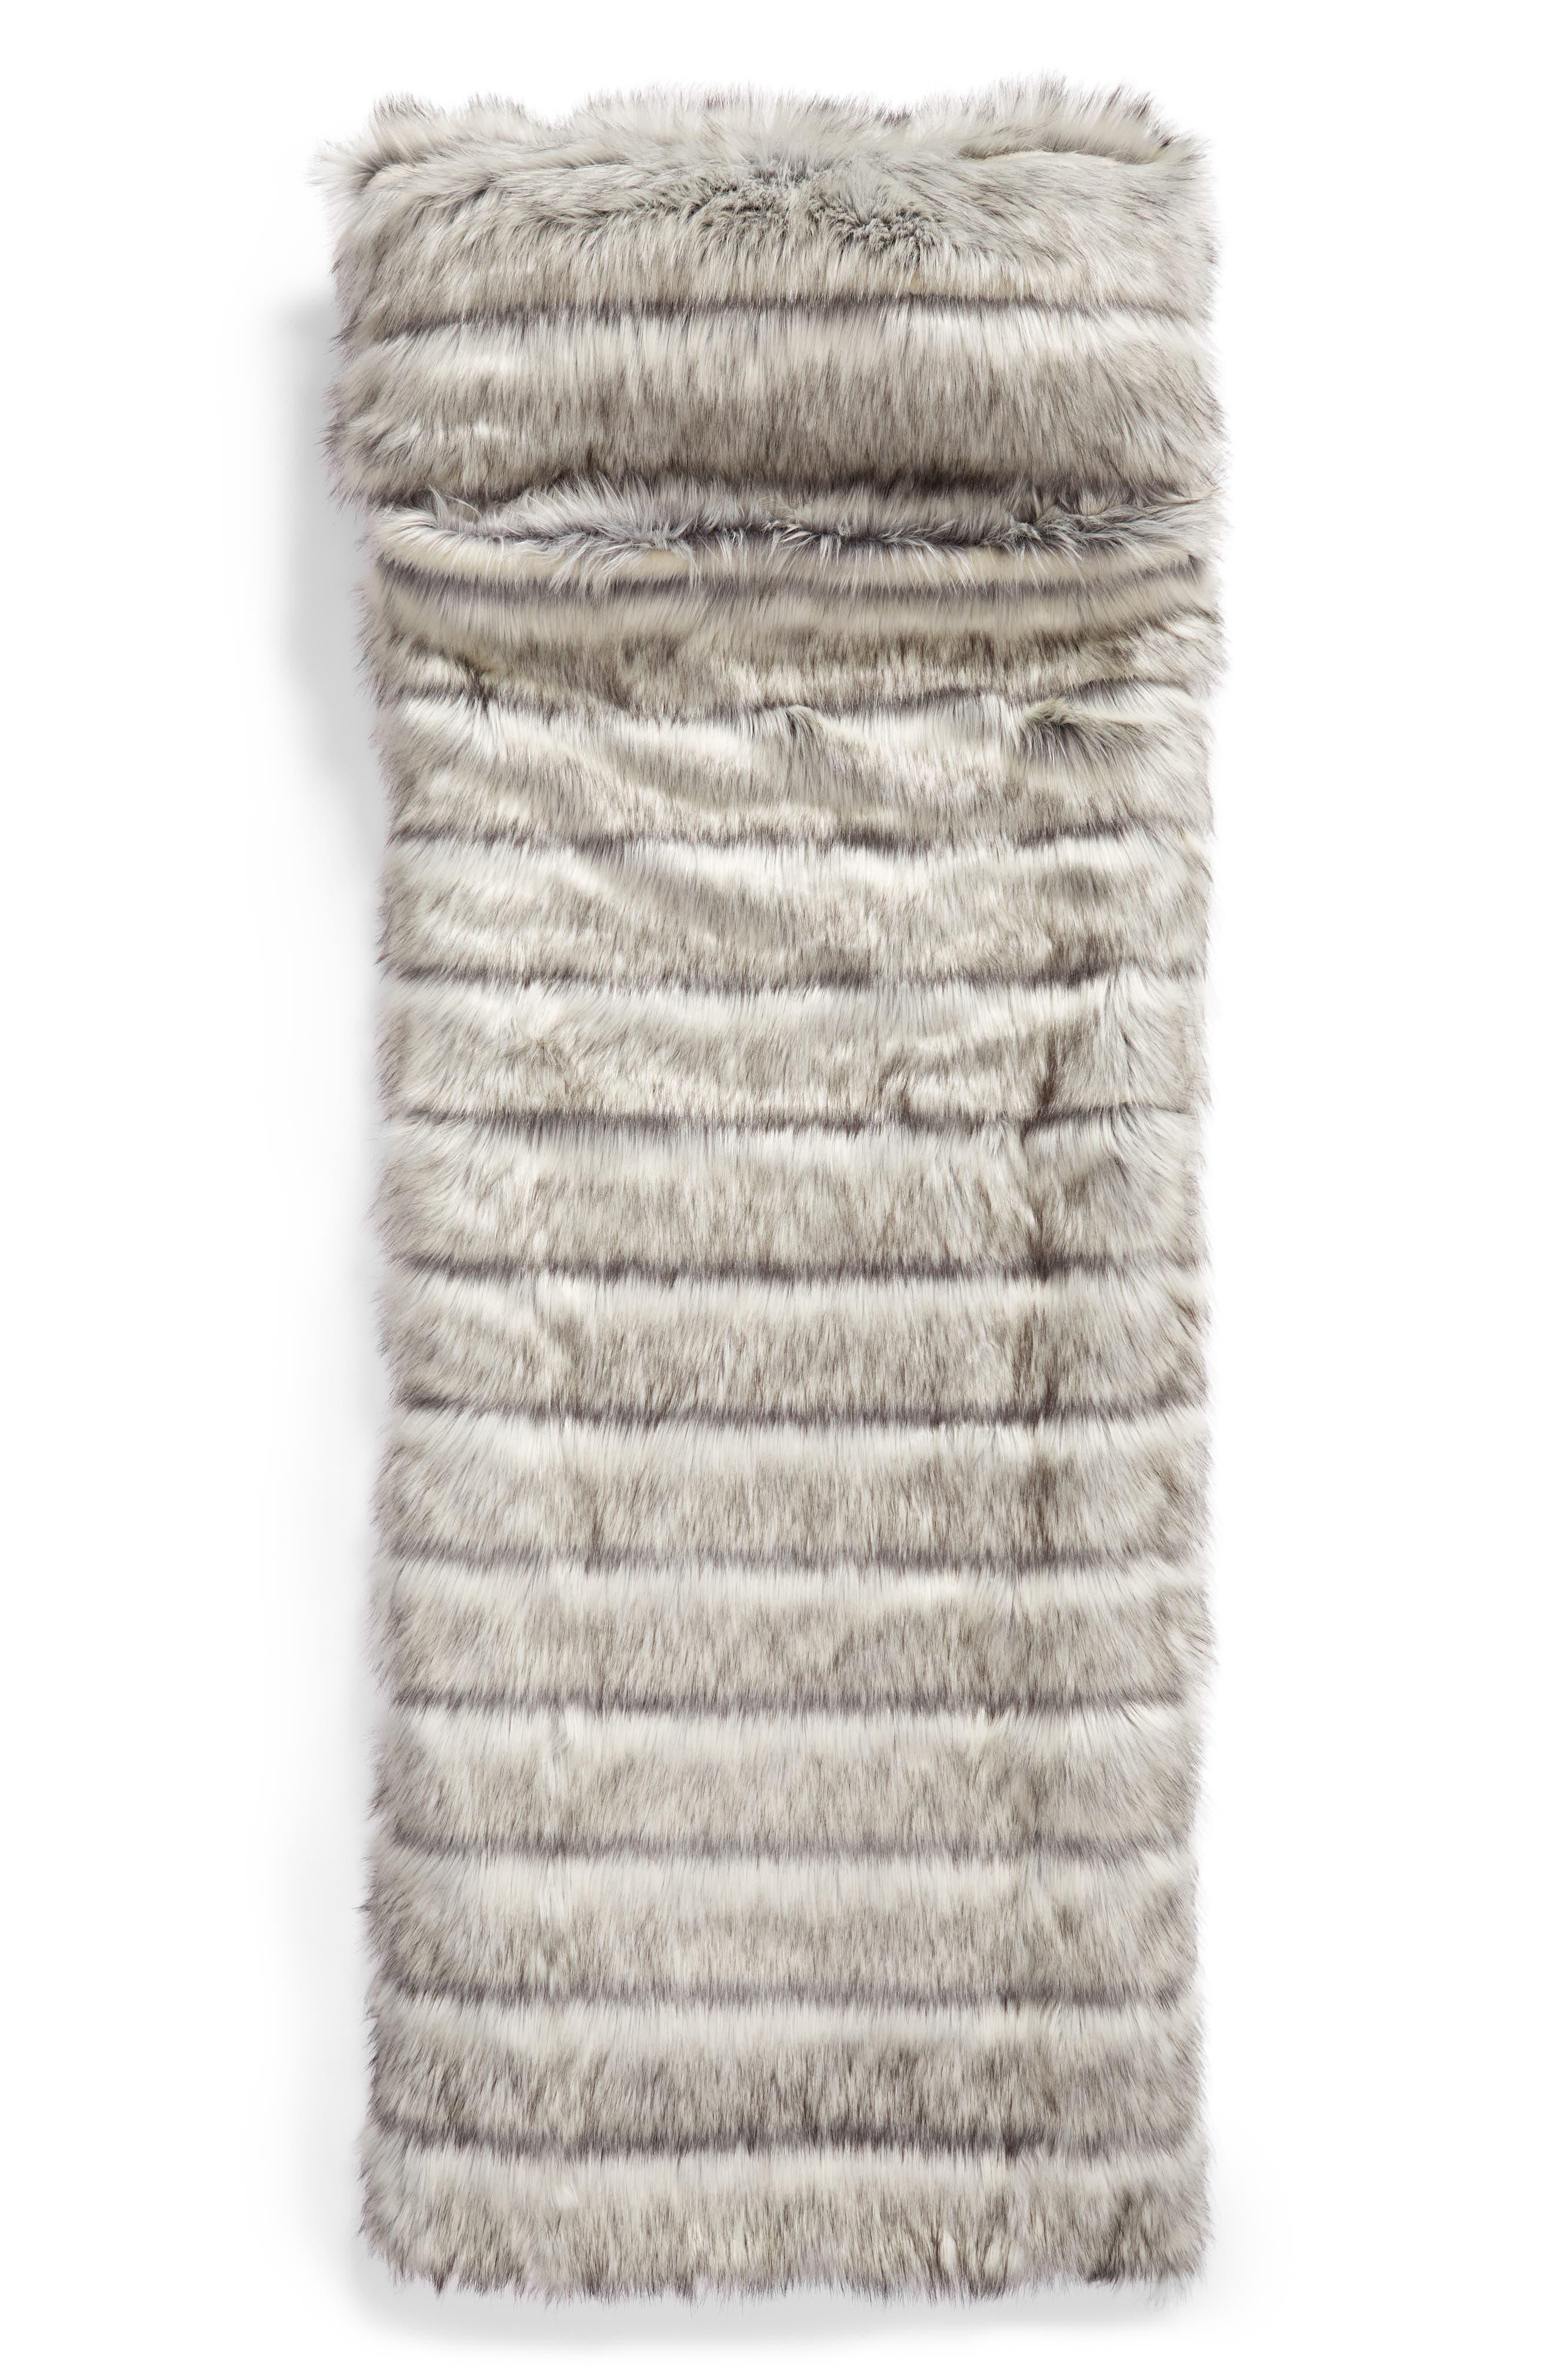 Luxe Faux Fur Slumber Bag,                         Main,                         color, GREY FROST MULTI